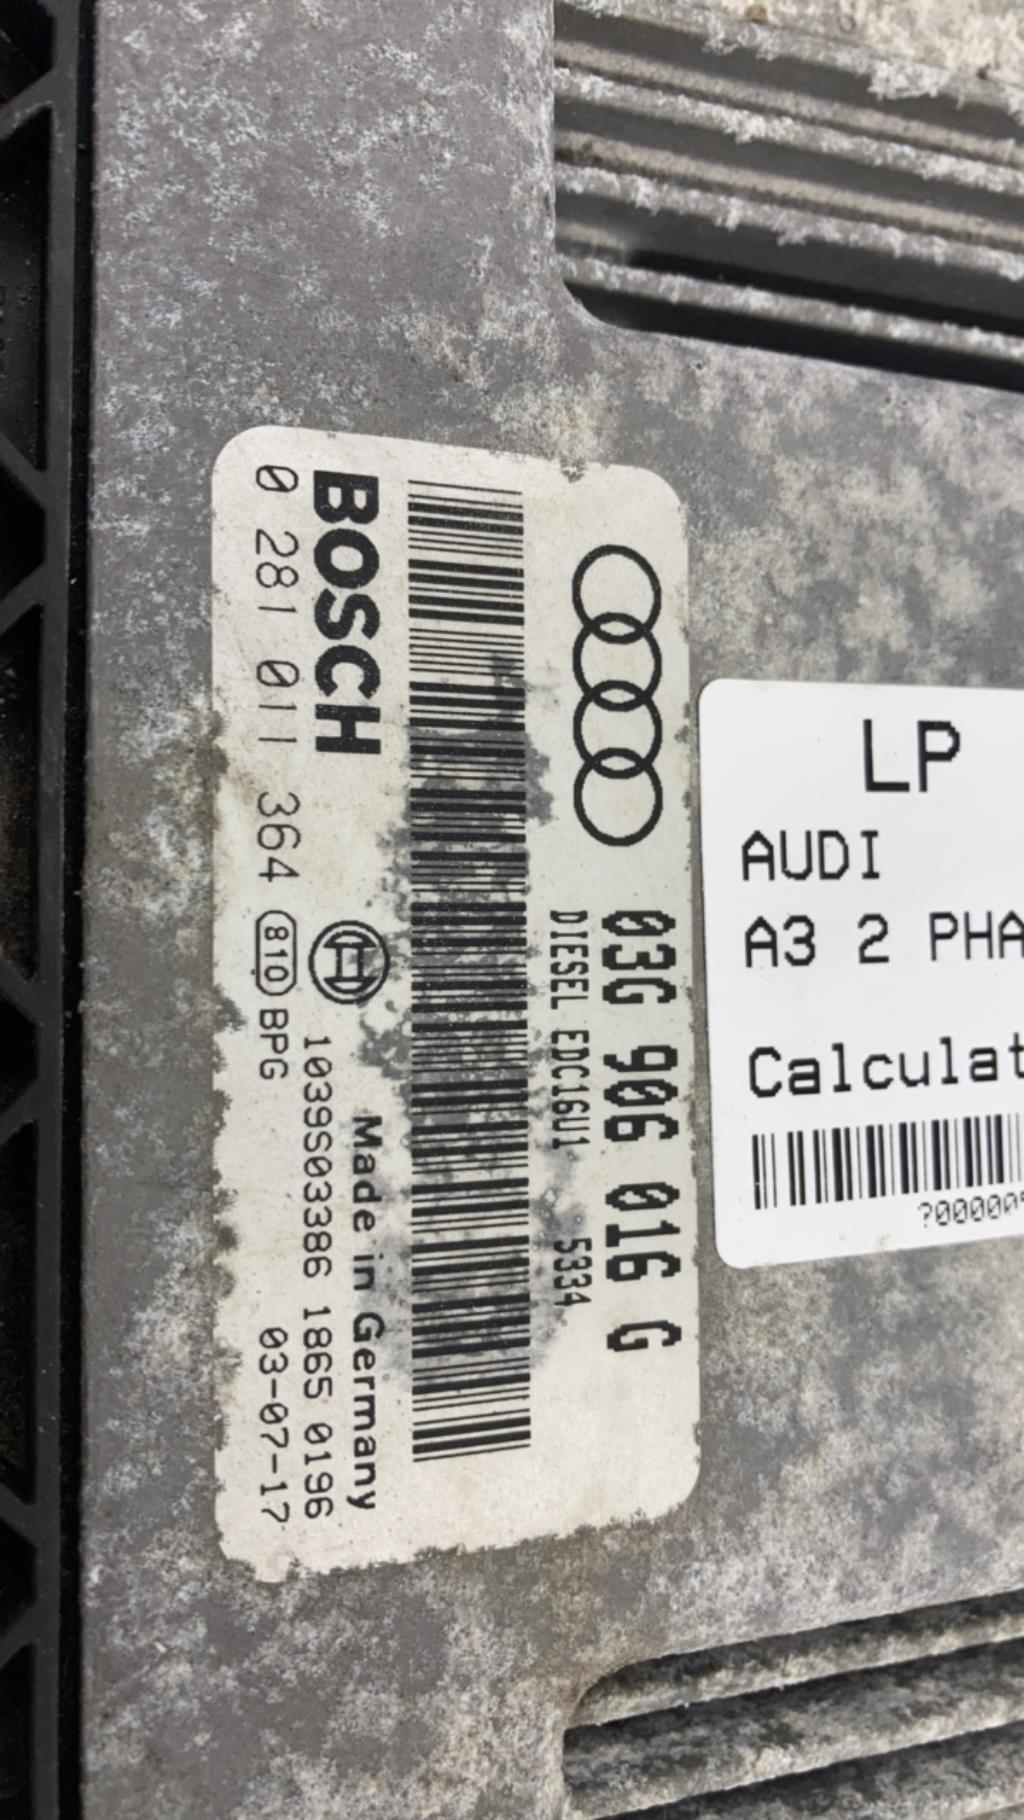 Calculateur AUDI A3 2 PHASE 1 Diesel